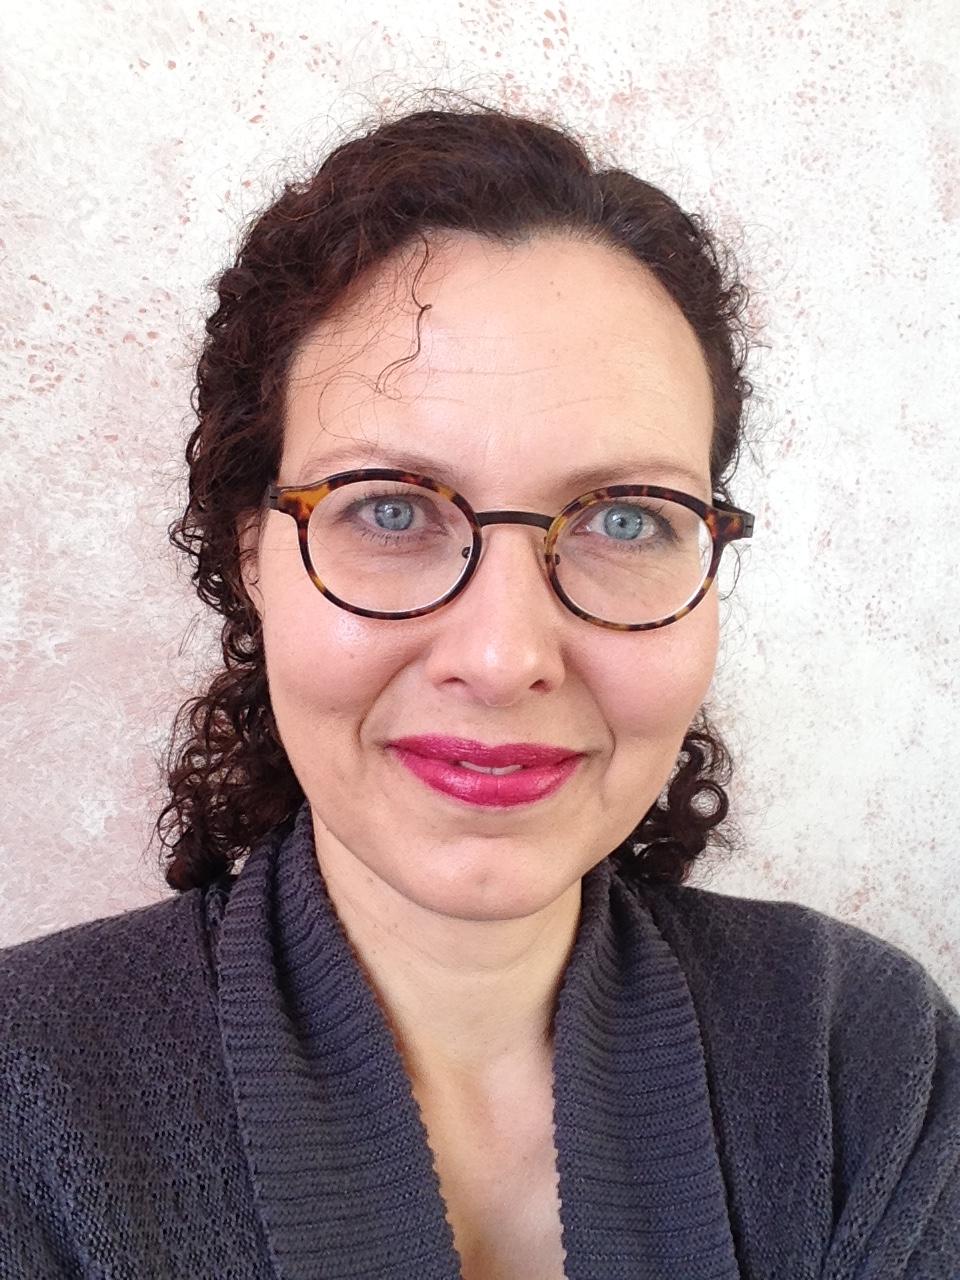 Marita Driessen profile image